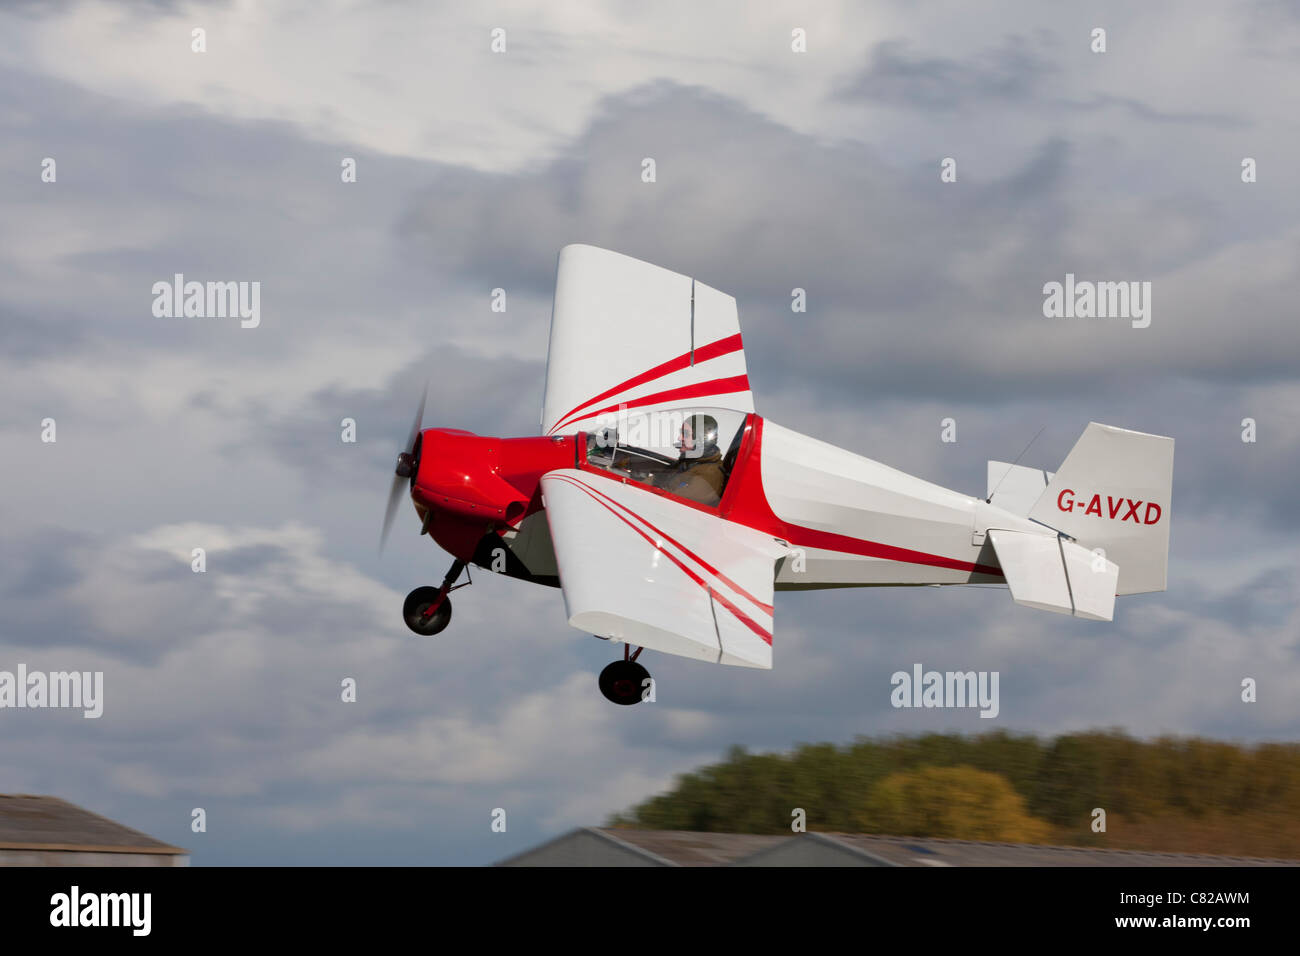 Tipsy T.66 RA45 Series 3 Nipper G-AVXD in flight at Breighton Airfield - Stock Image